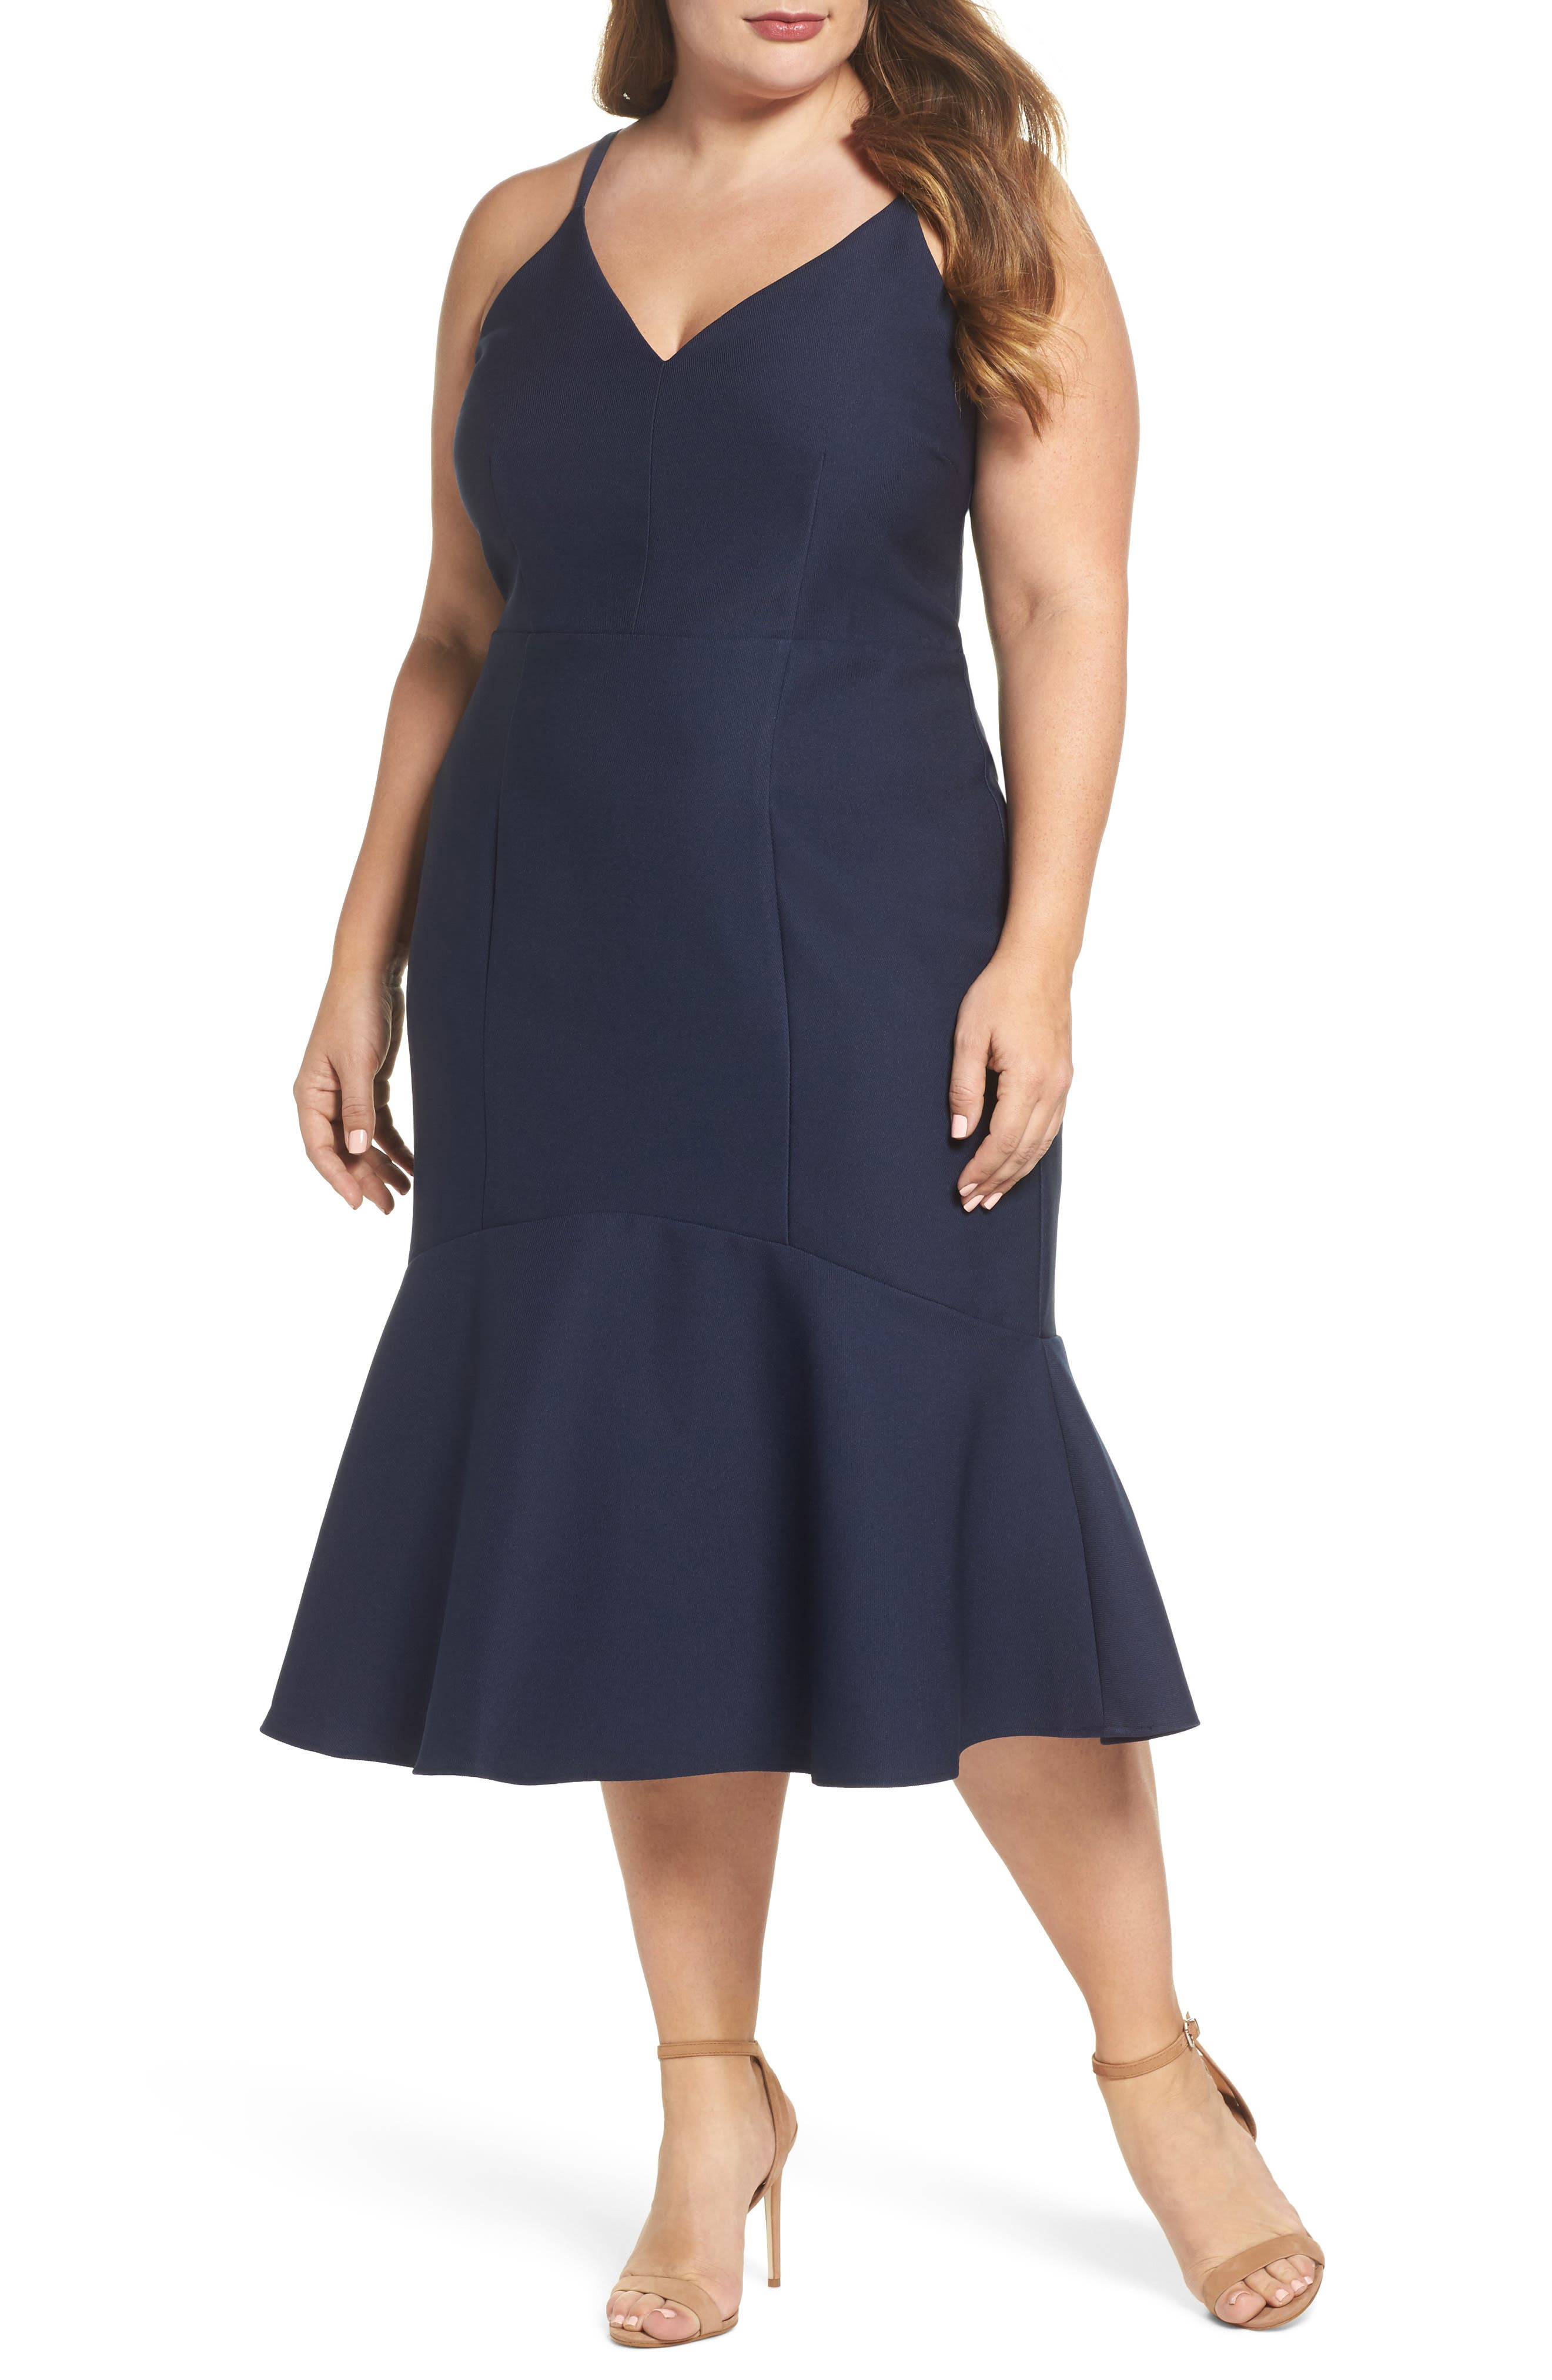 Alternate Image 1 Selected - Cooper St Azalea Flounce Hem Dress (Plus Size)